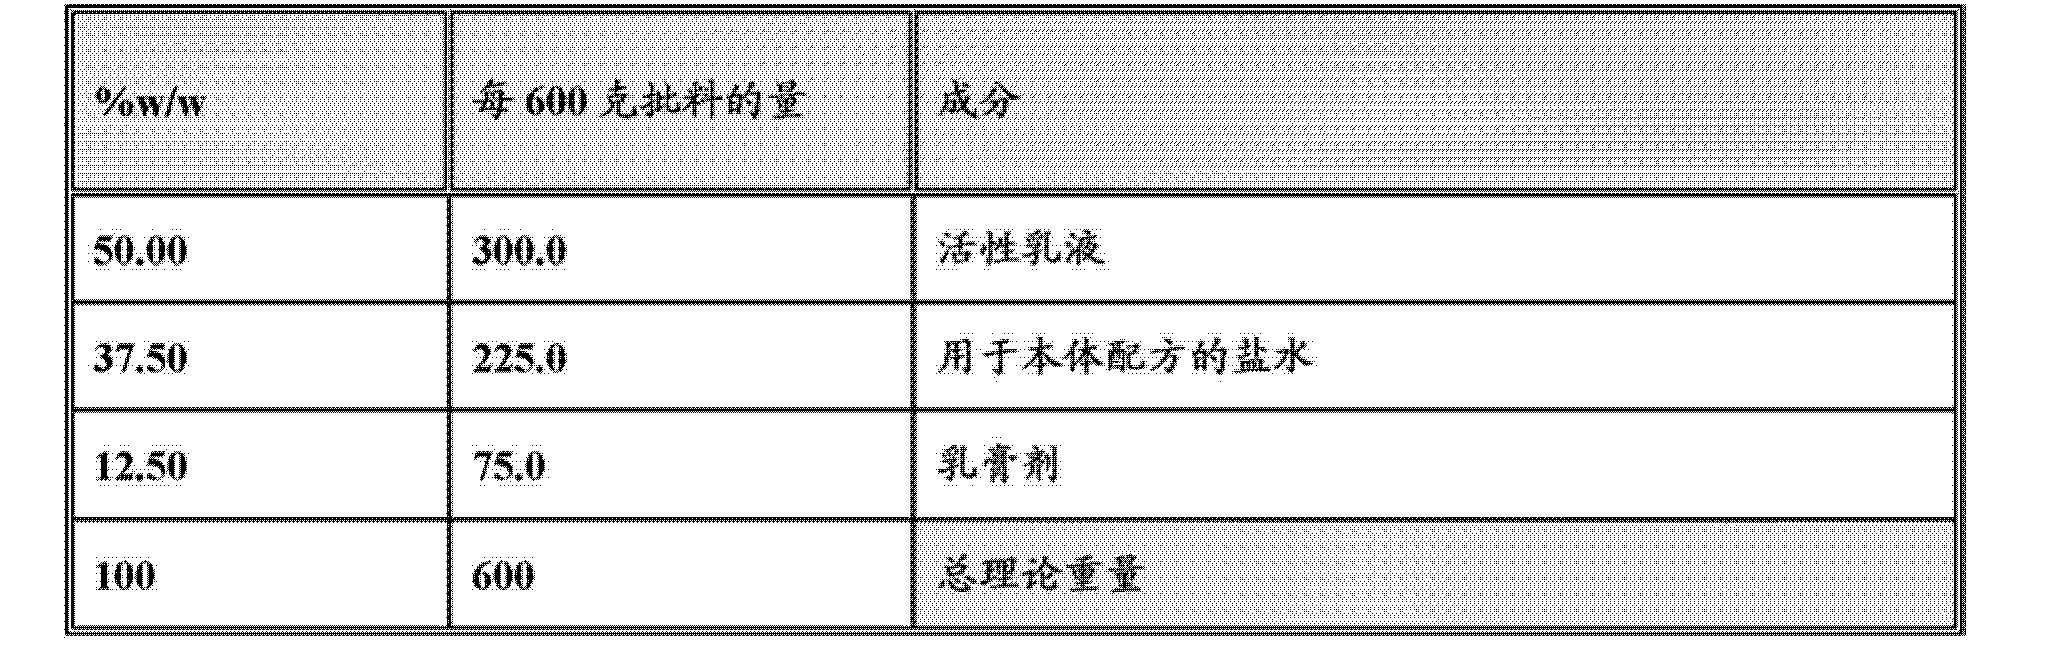 Figure CN103747782AD00953